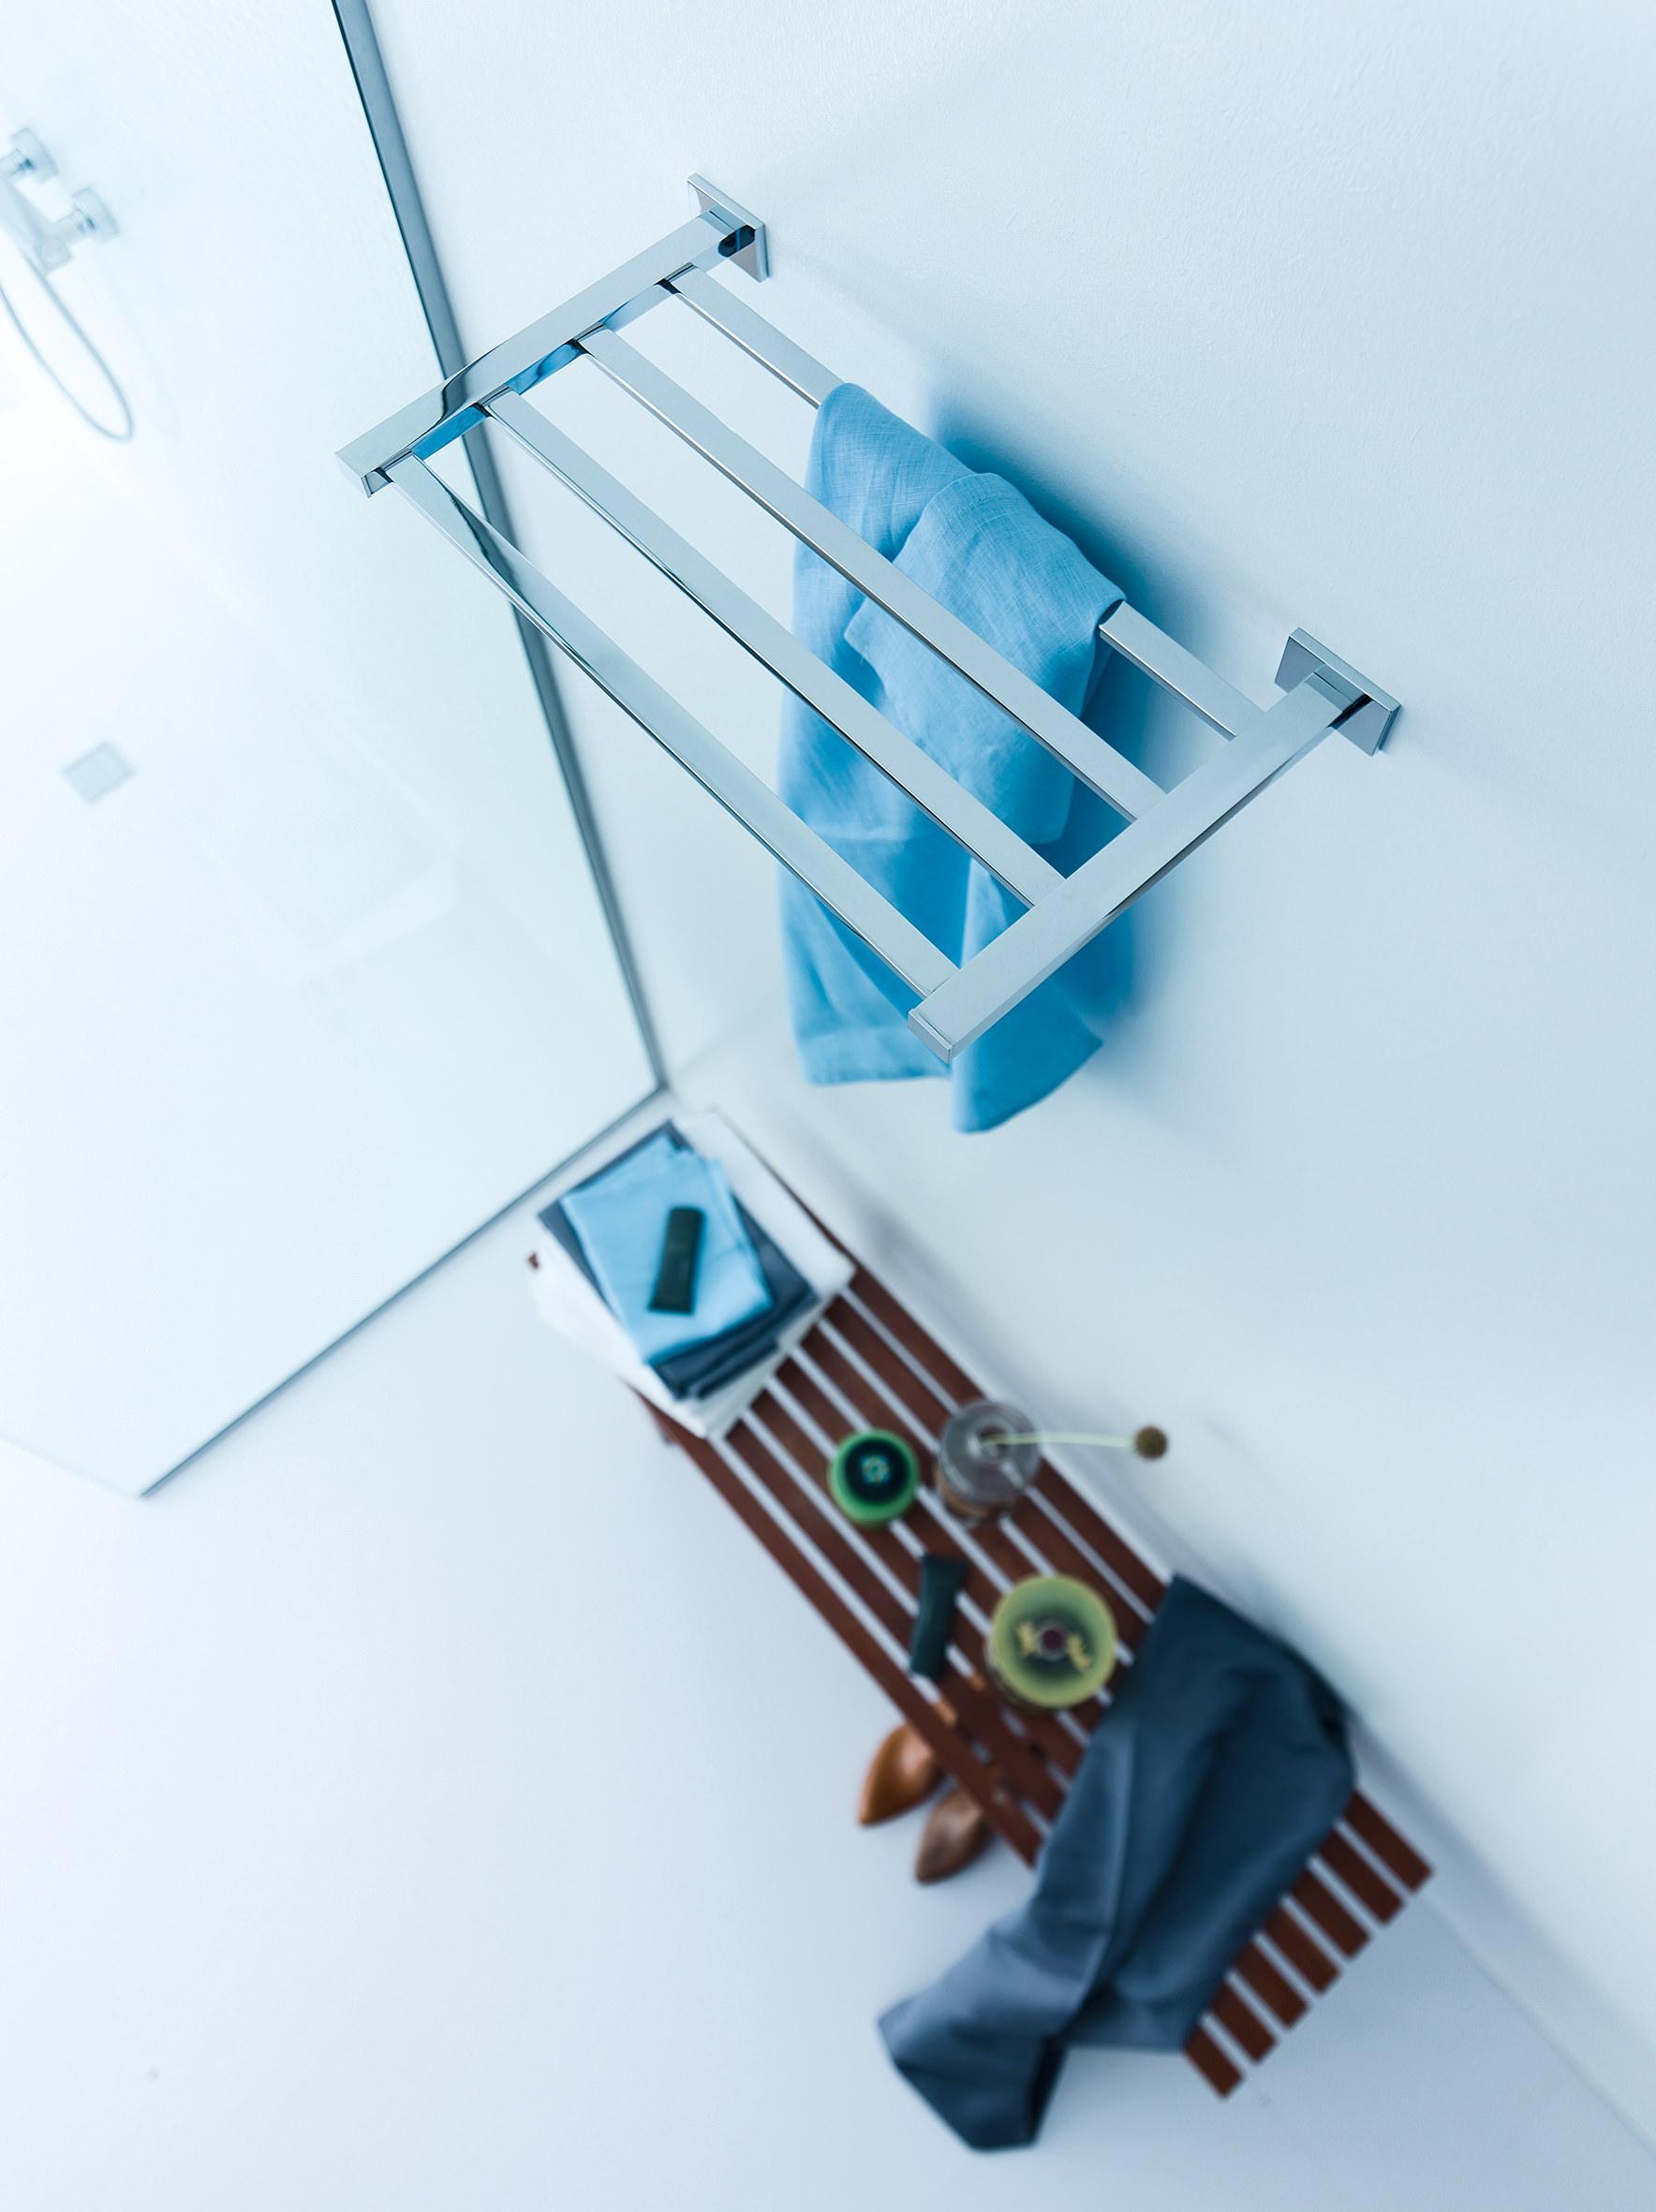 Accessori Per La Doccia : Accessori per la doccia